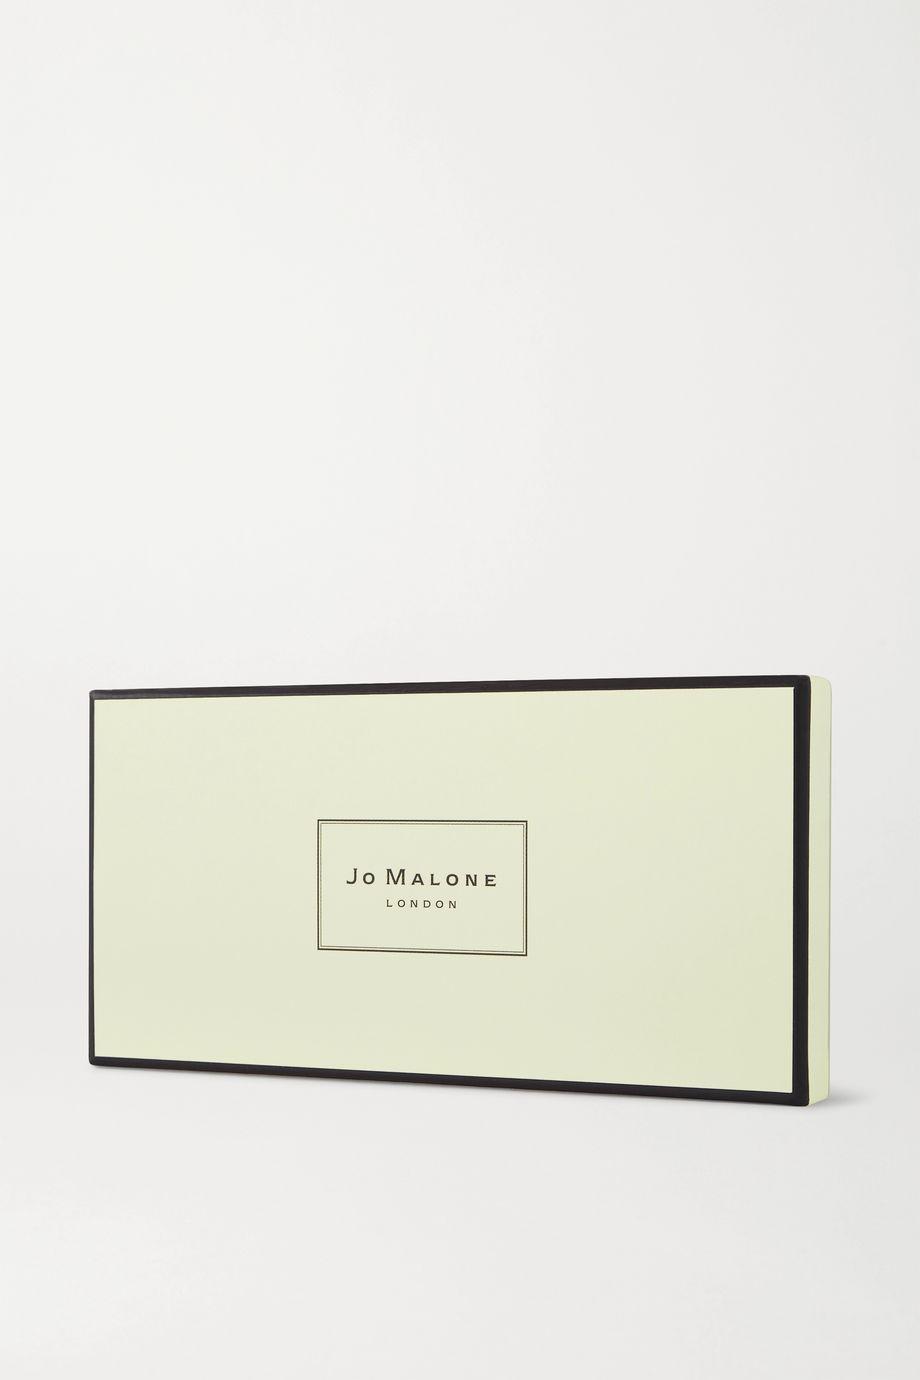 Jo Malone London Cologne Intense Collection, 5 x 9ml